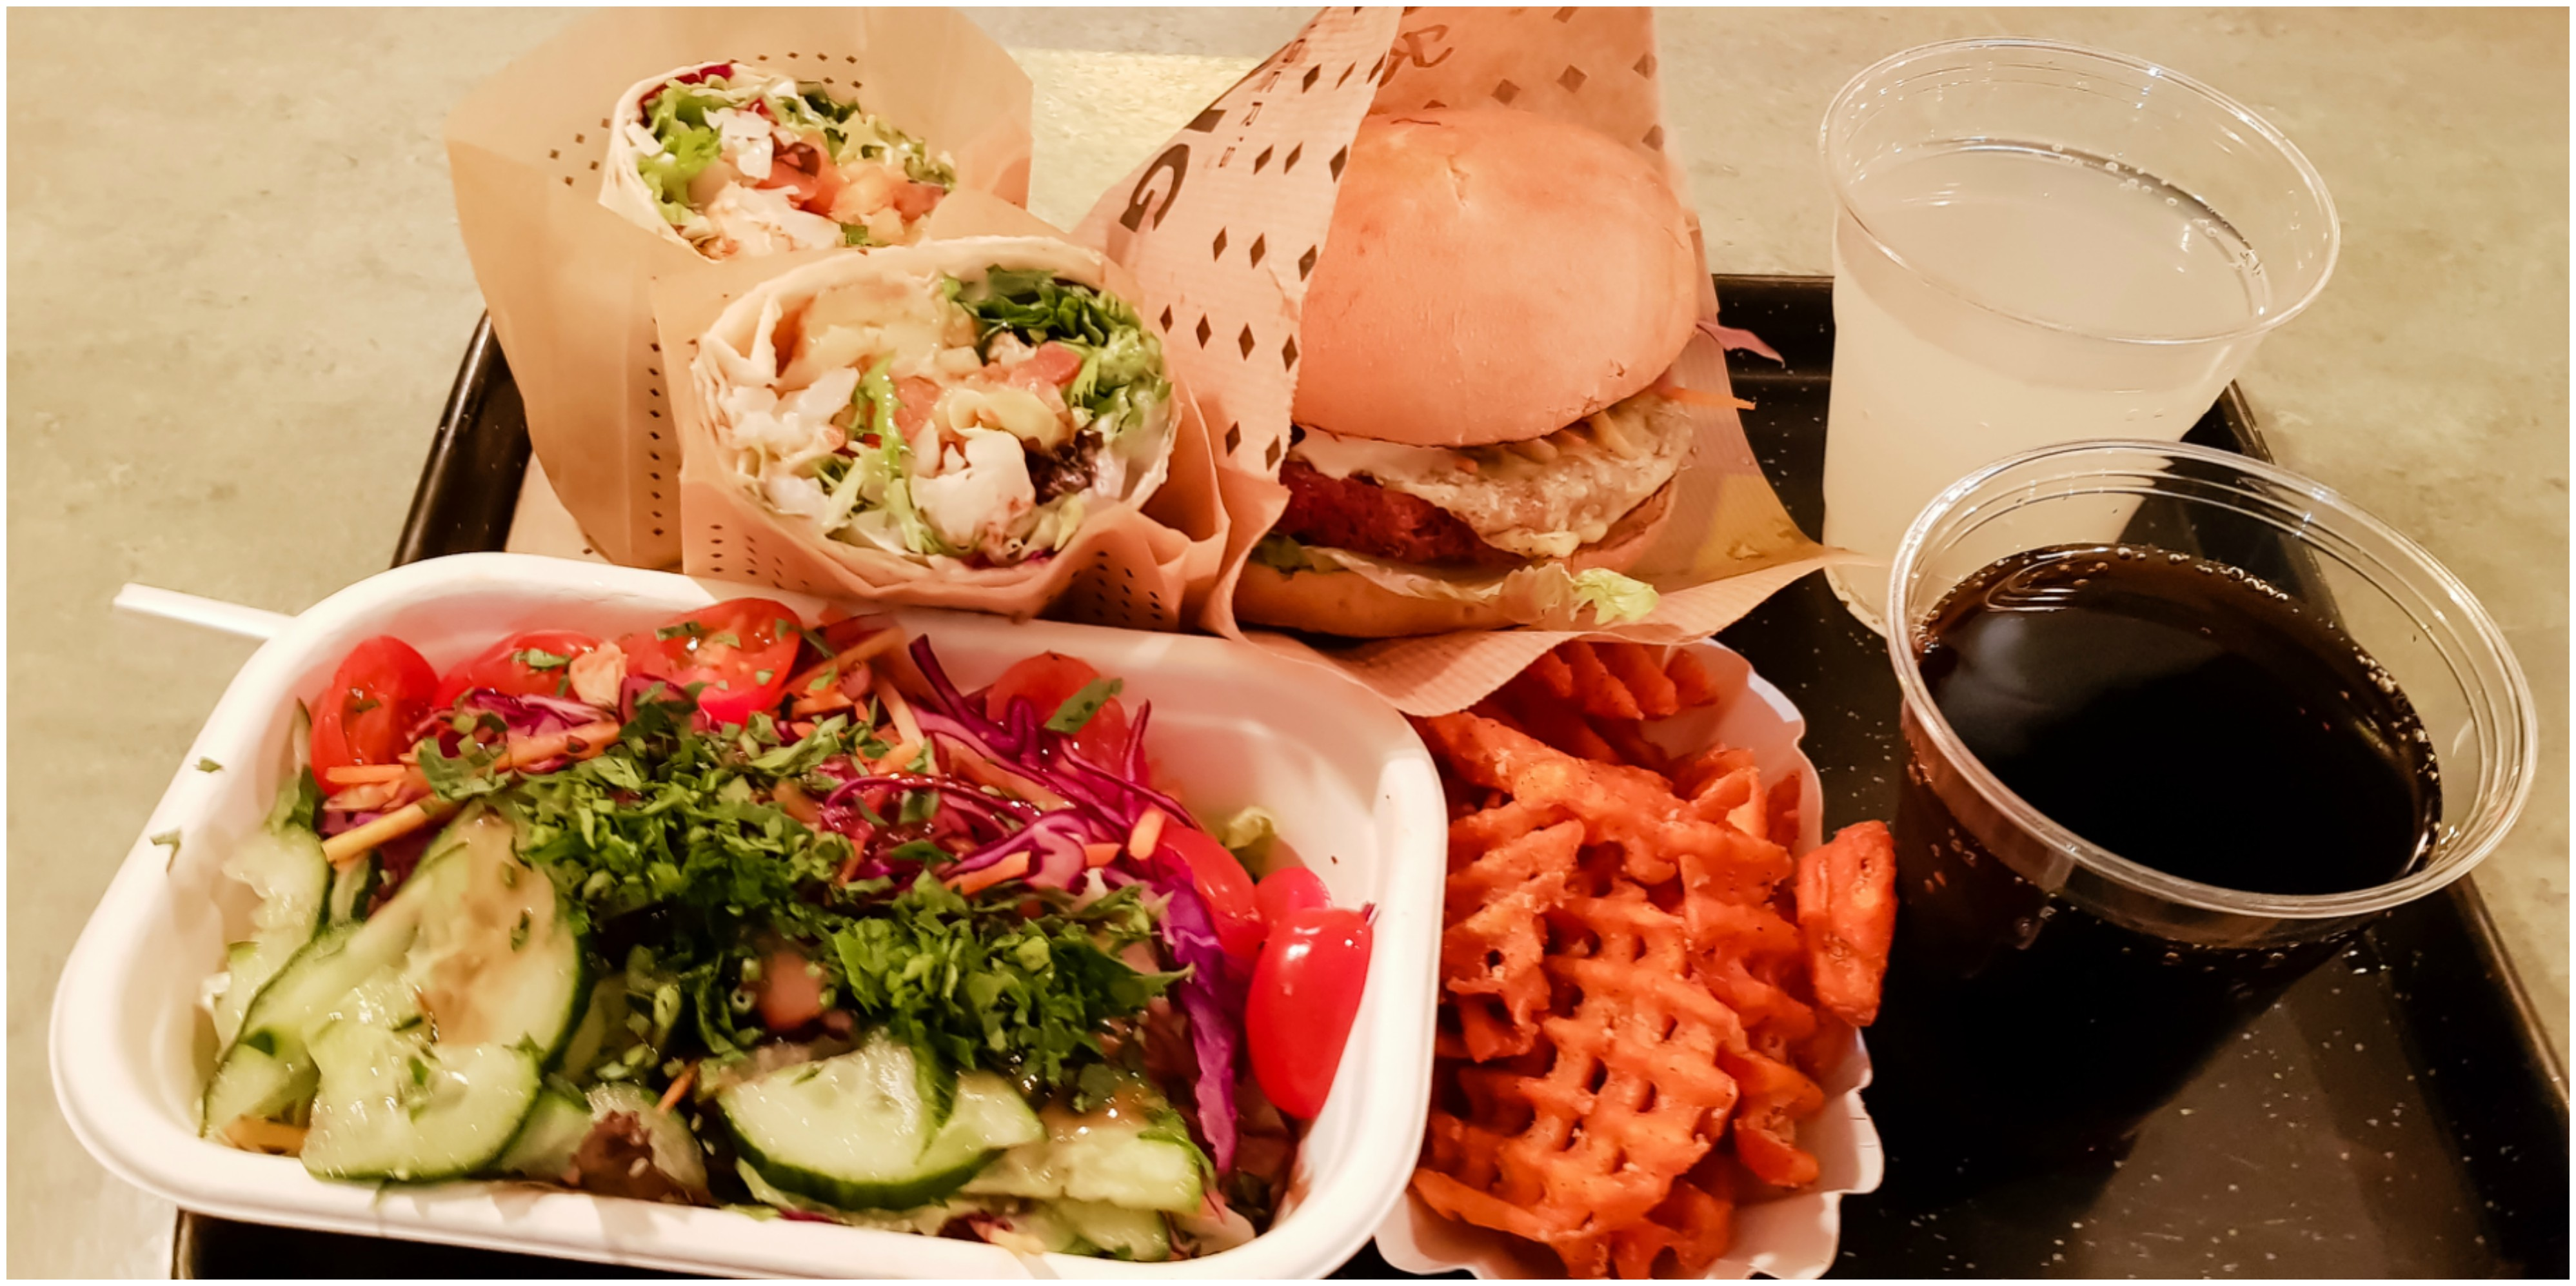 swing-kitchen-wien-vegan-burger-wrap-salad